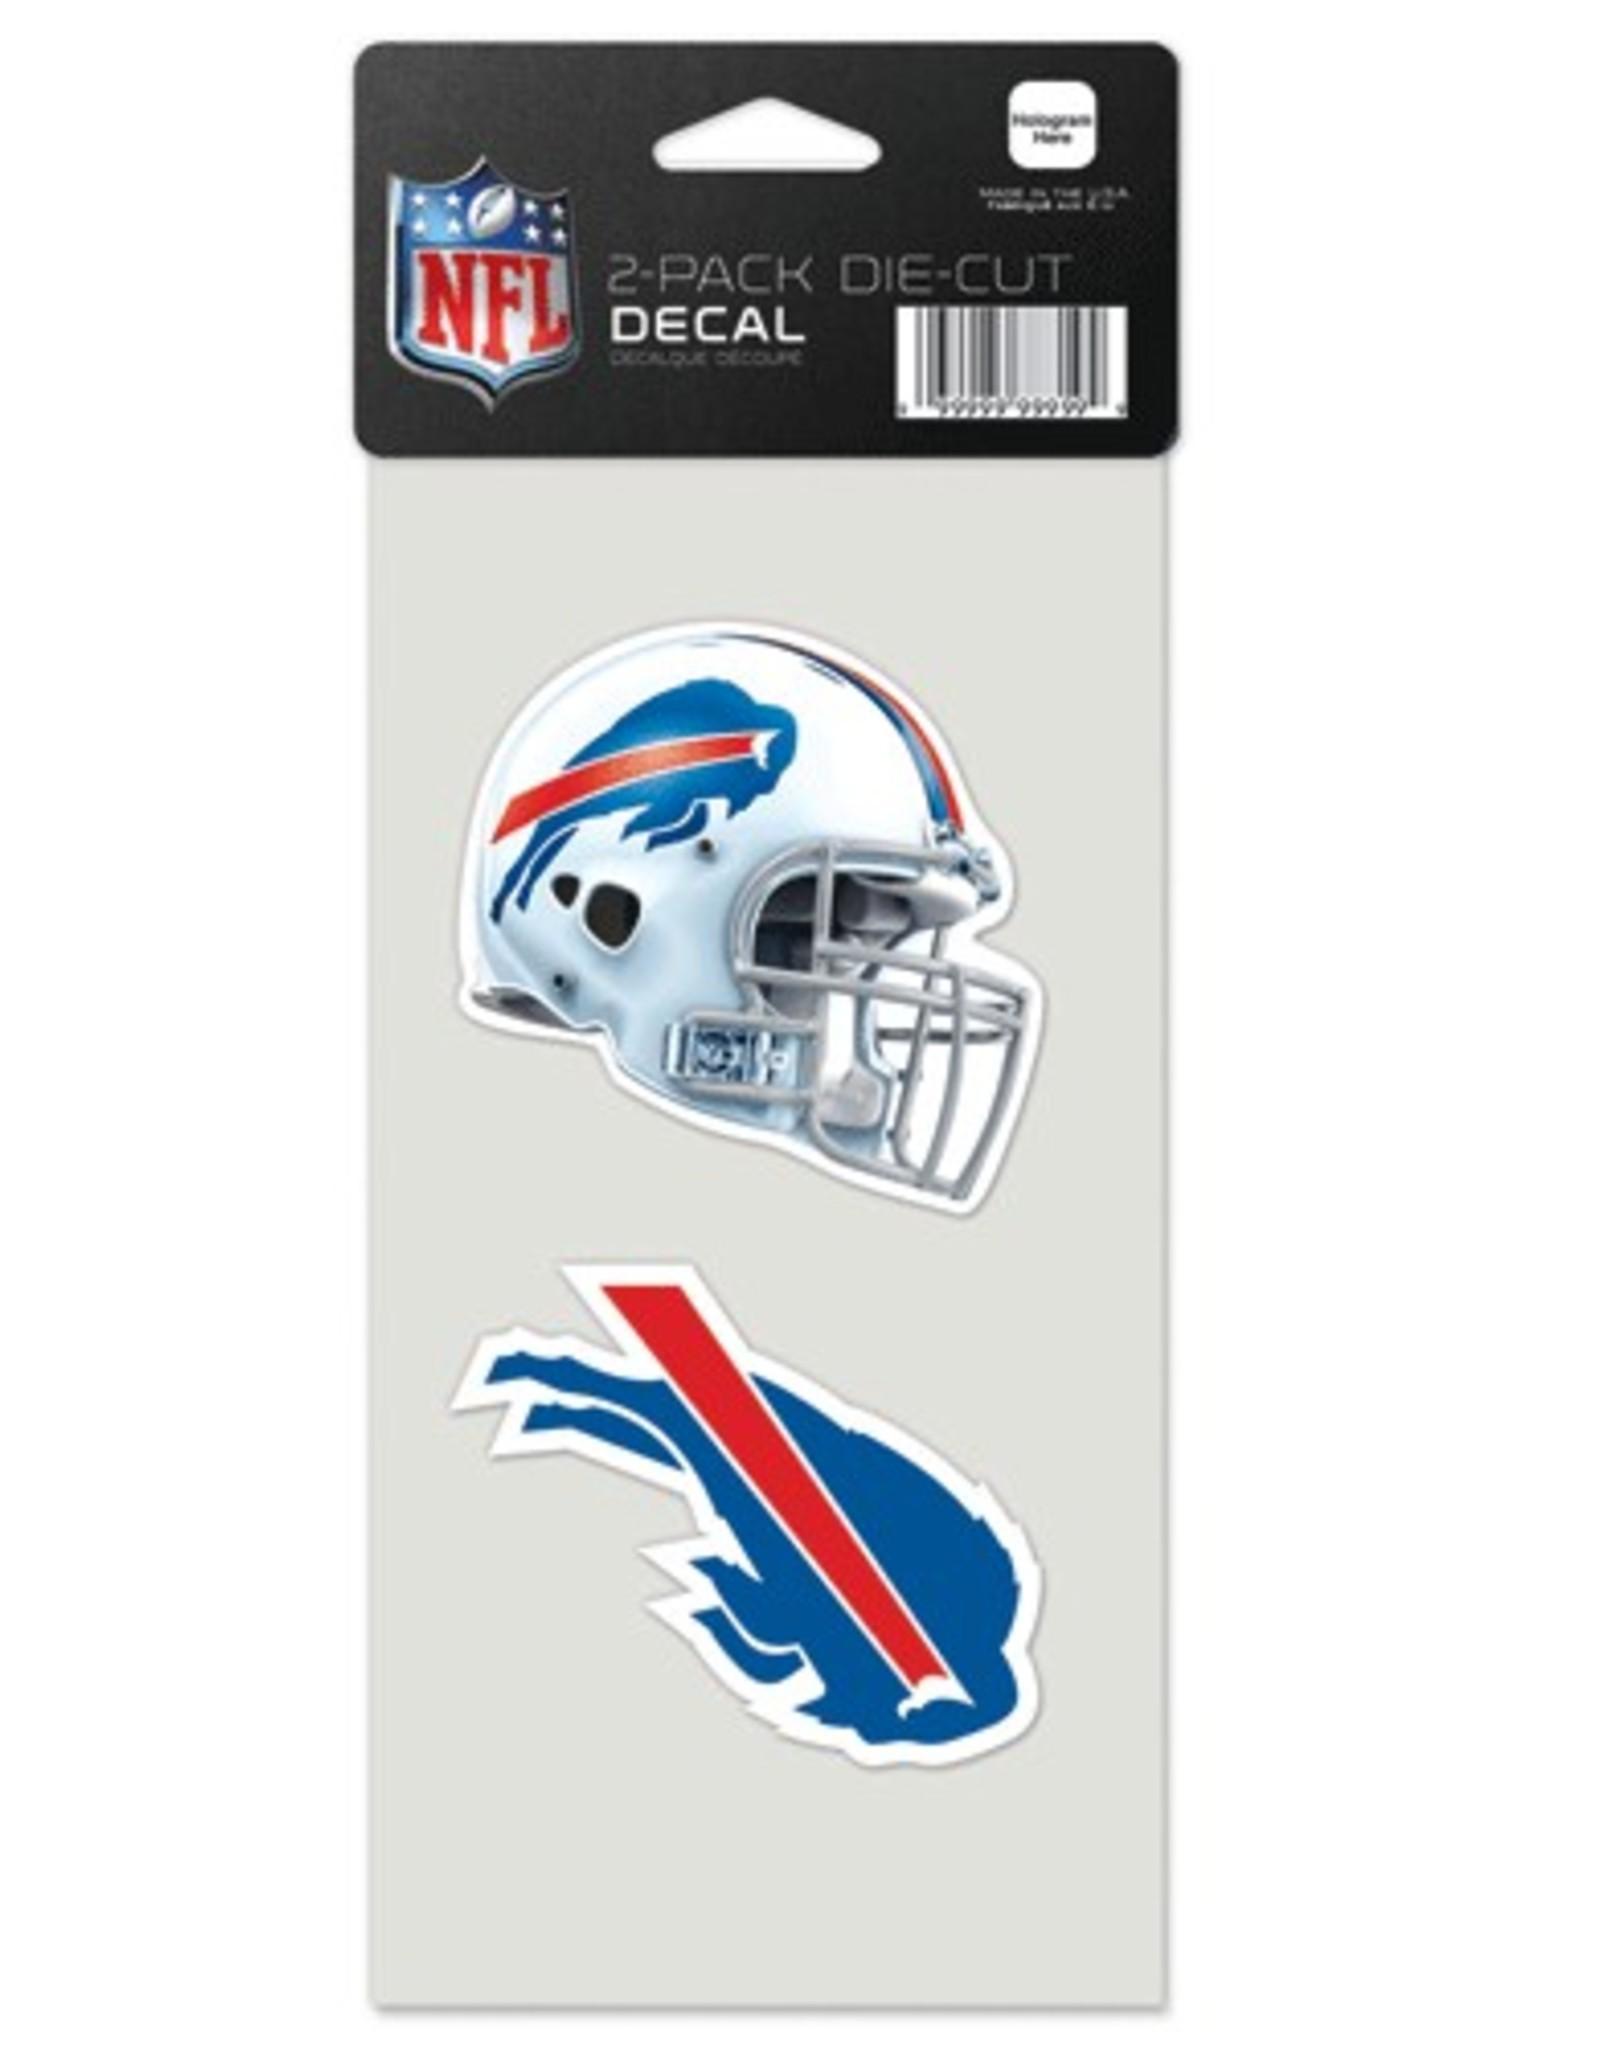 Buffalo Bills Set of Two 4x4 Perfect Cut Decals